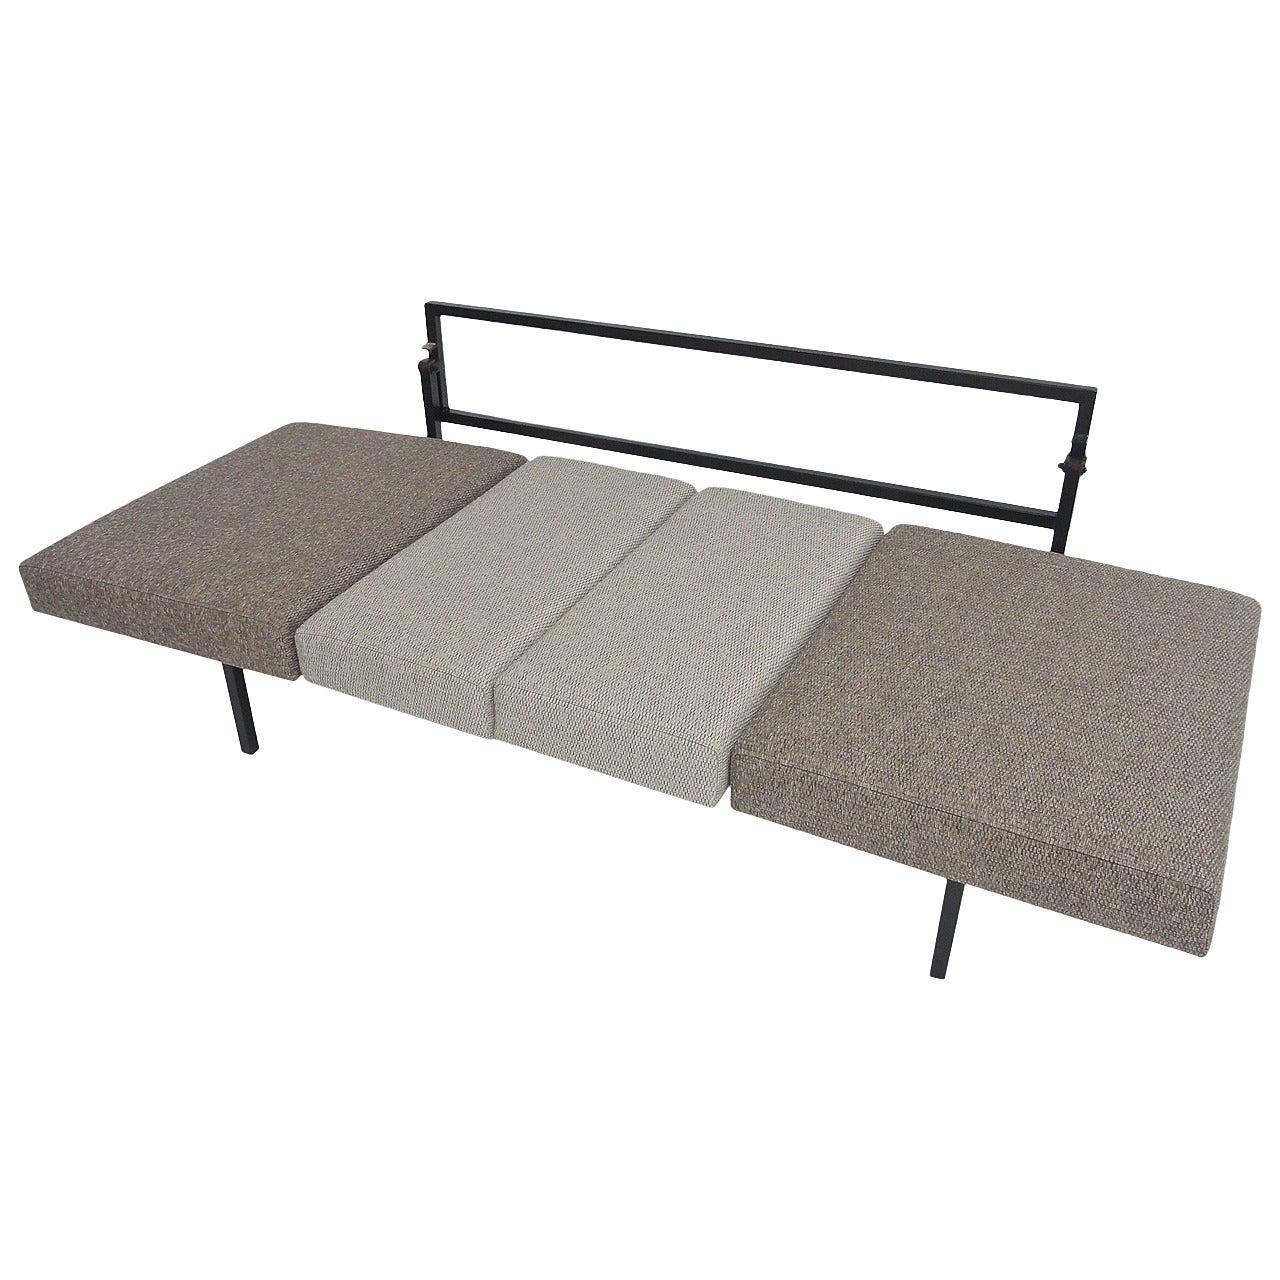 Dutch Modernist Pioneer Coen de Vries Sleeping Sofa, Devo, 1952